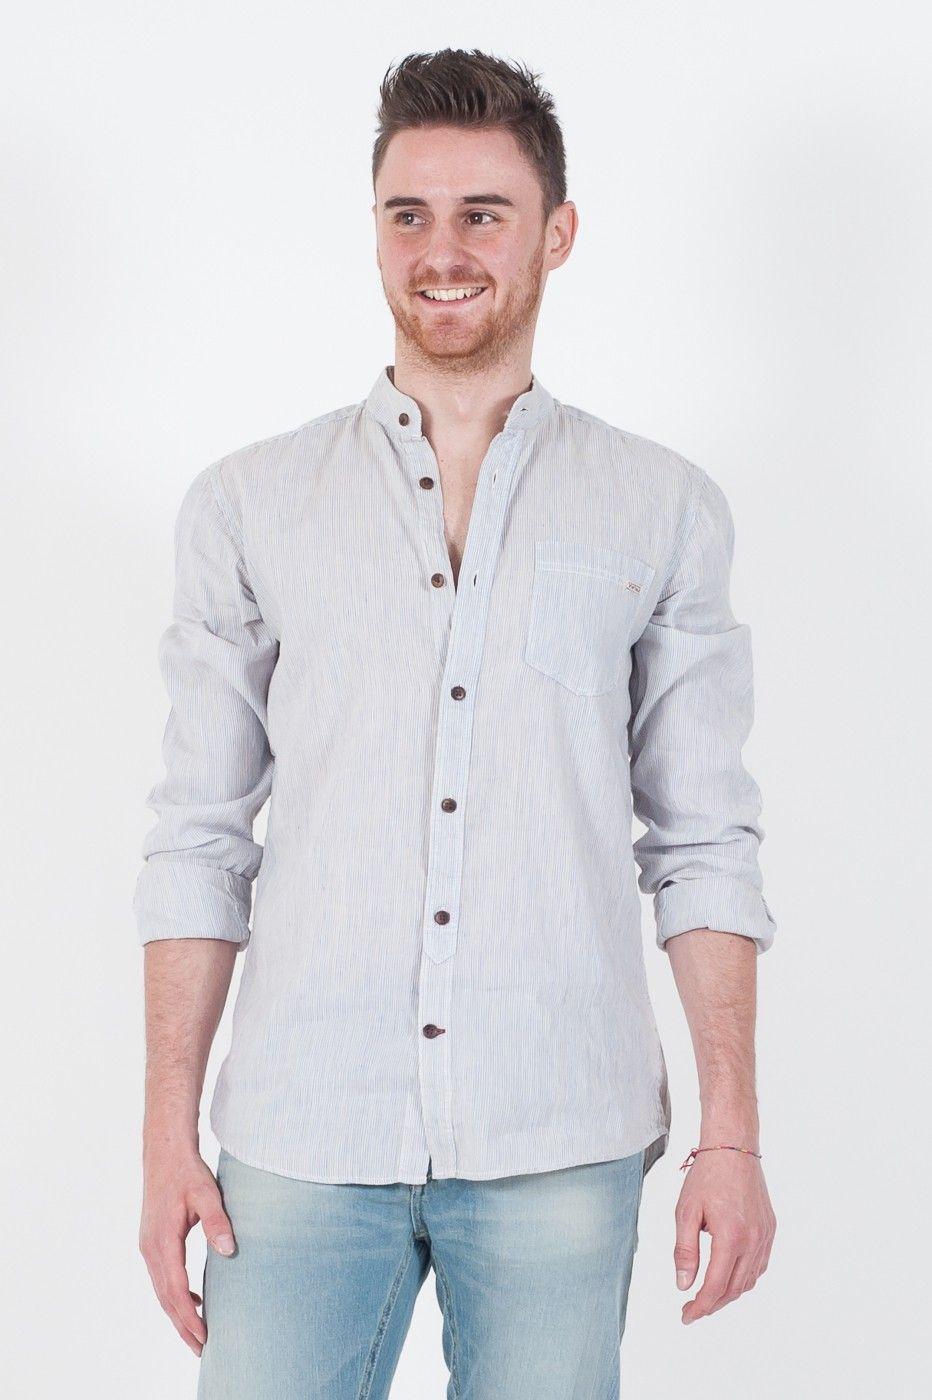 #Camicia da #uomo #Jack&Jones #Vintage Clothing. - Fantasia Microriga -  Collo